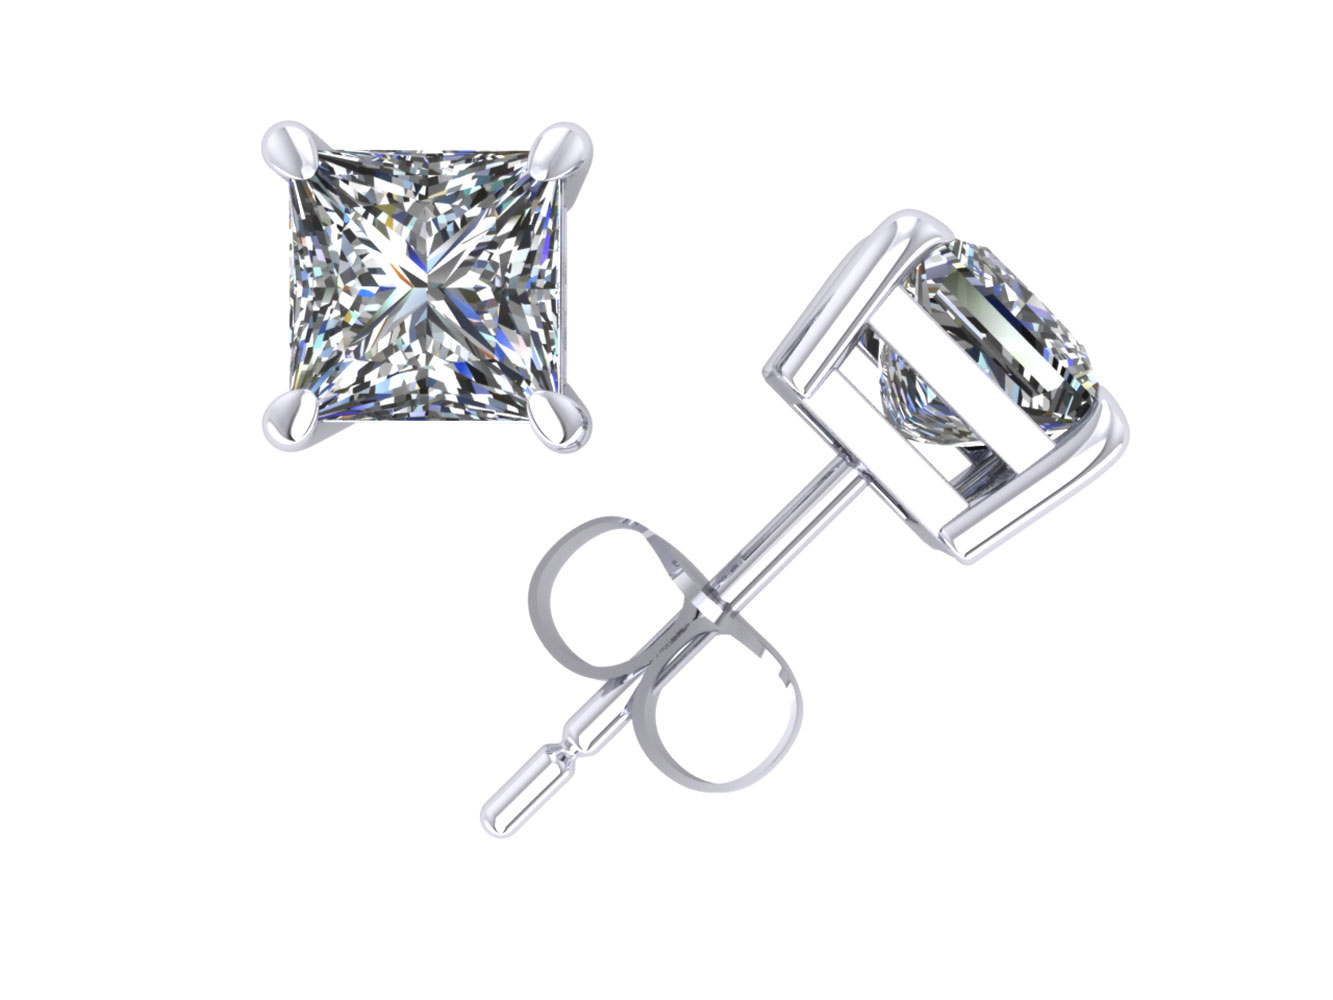 1 00ct Princess Diamond Solitaire Stud Earrings 18k White